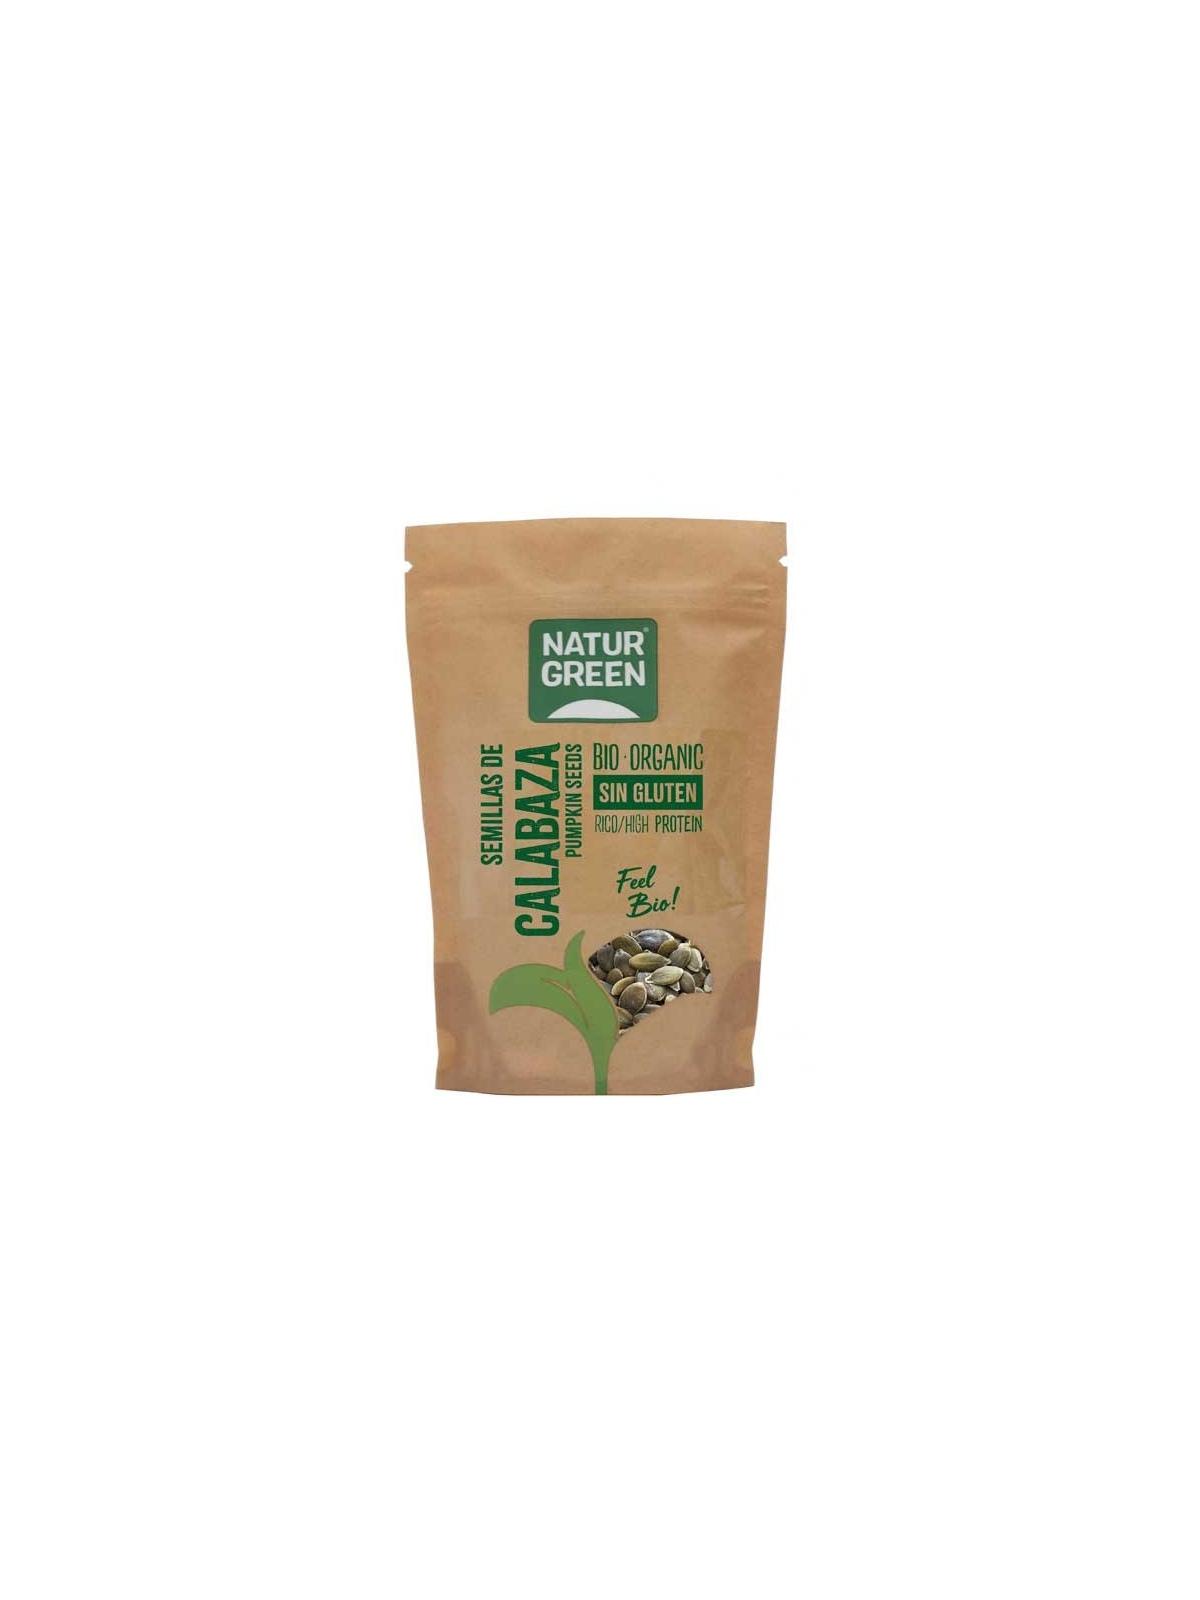 Bolsa Doypack de Semillas de Calabaza Bio Naturgreen 225 g 450 g